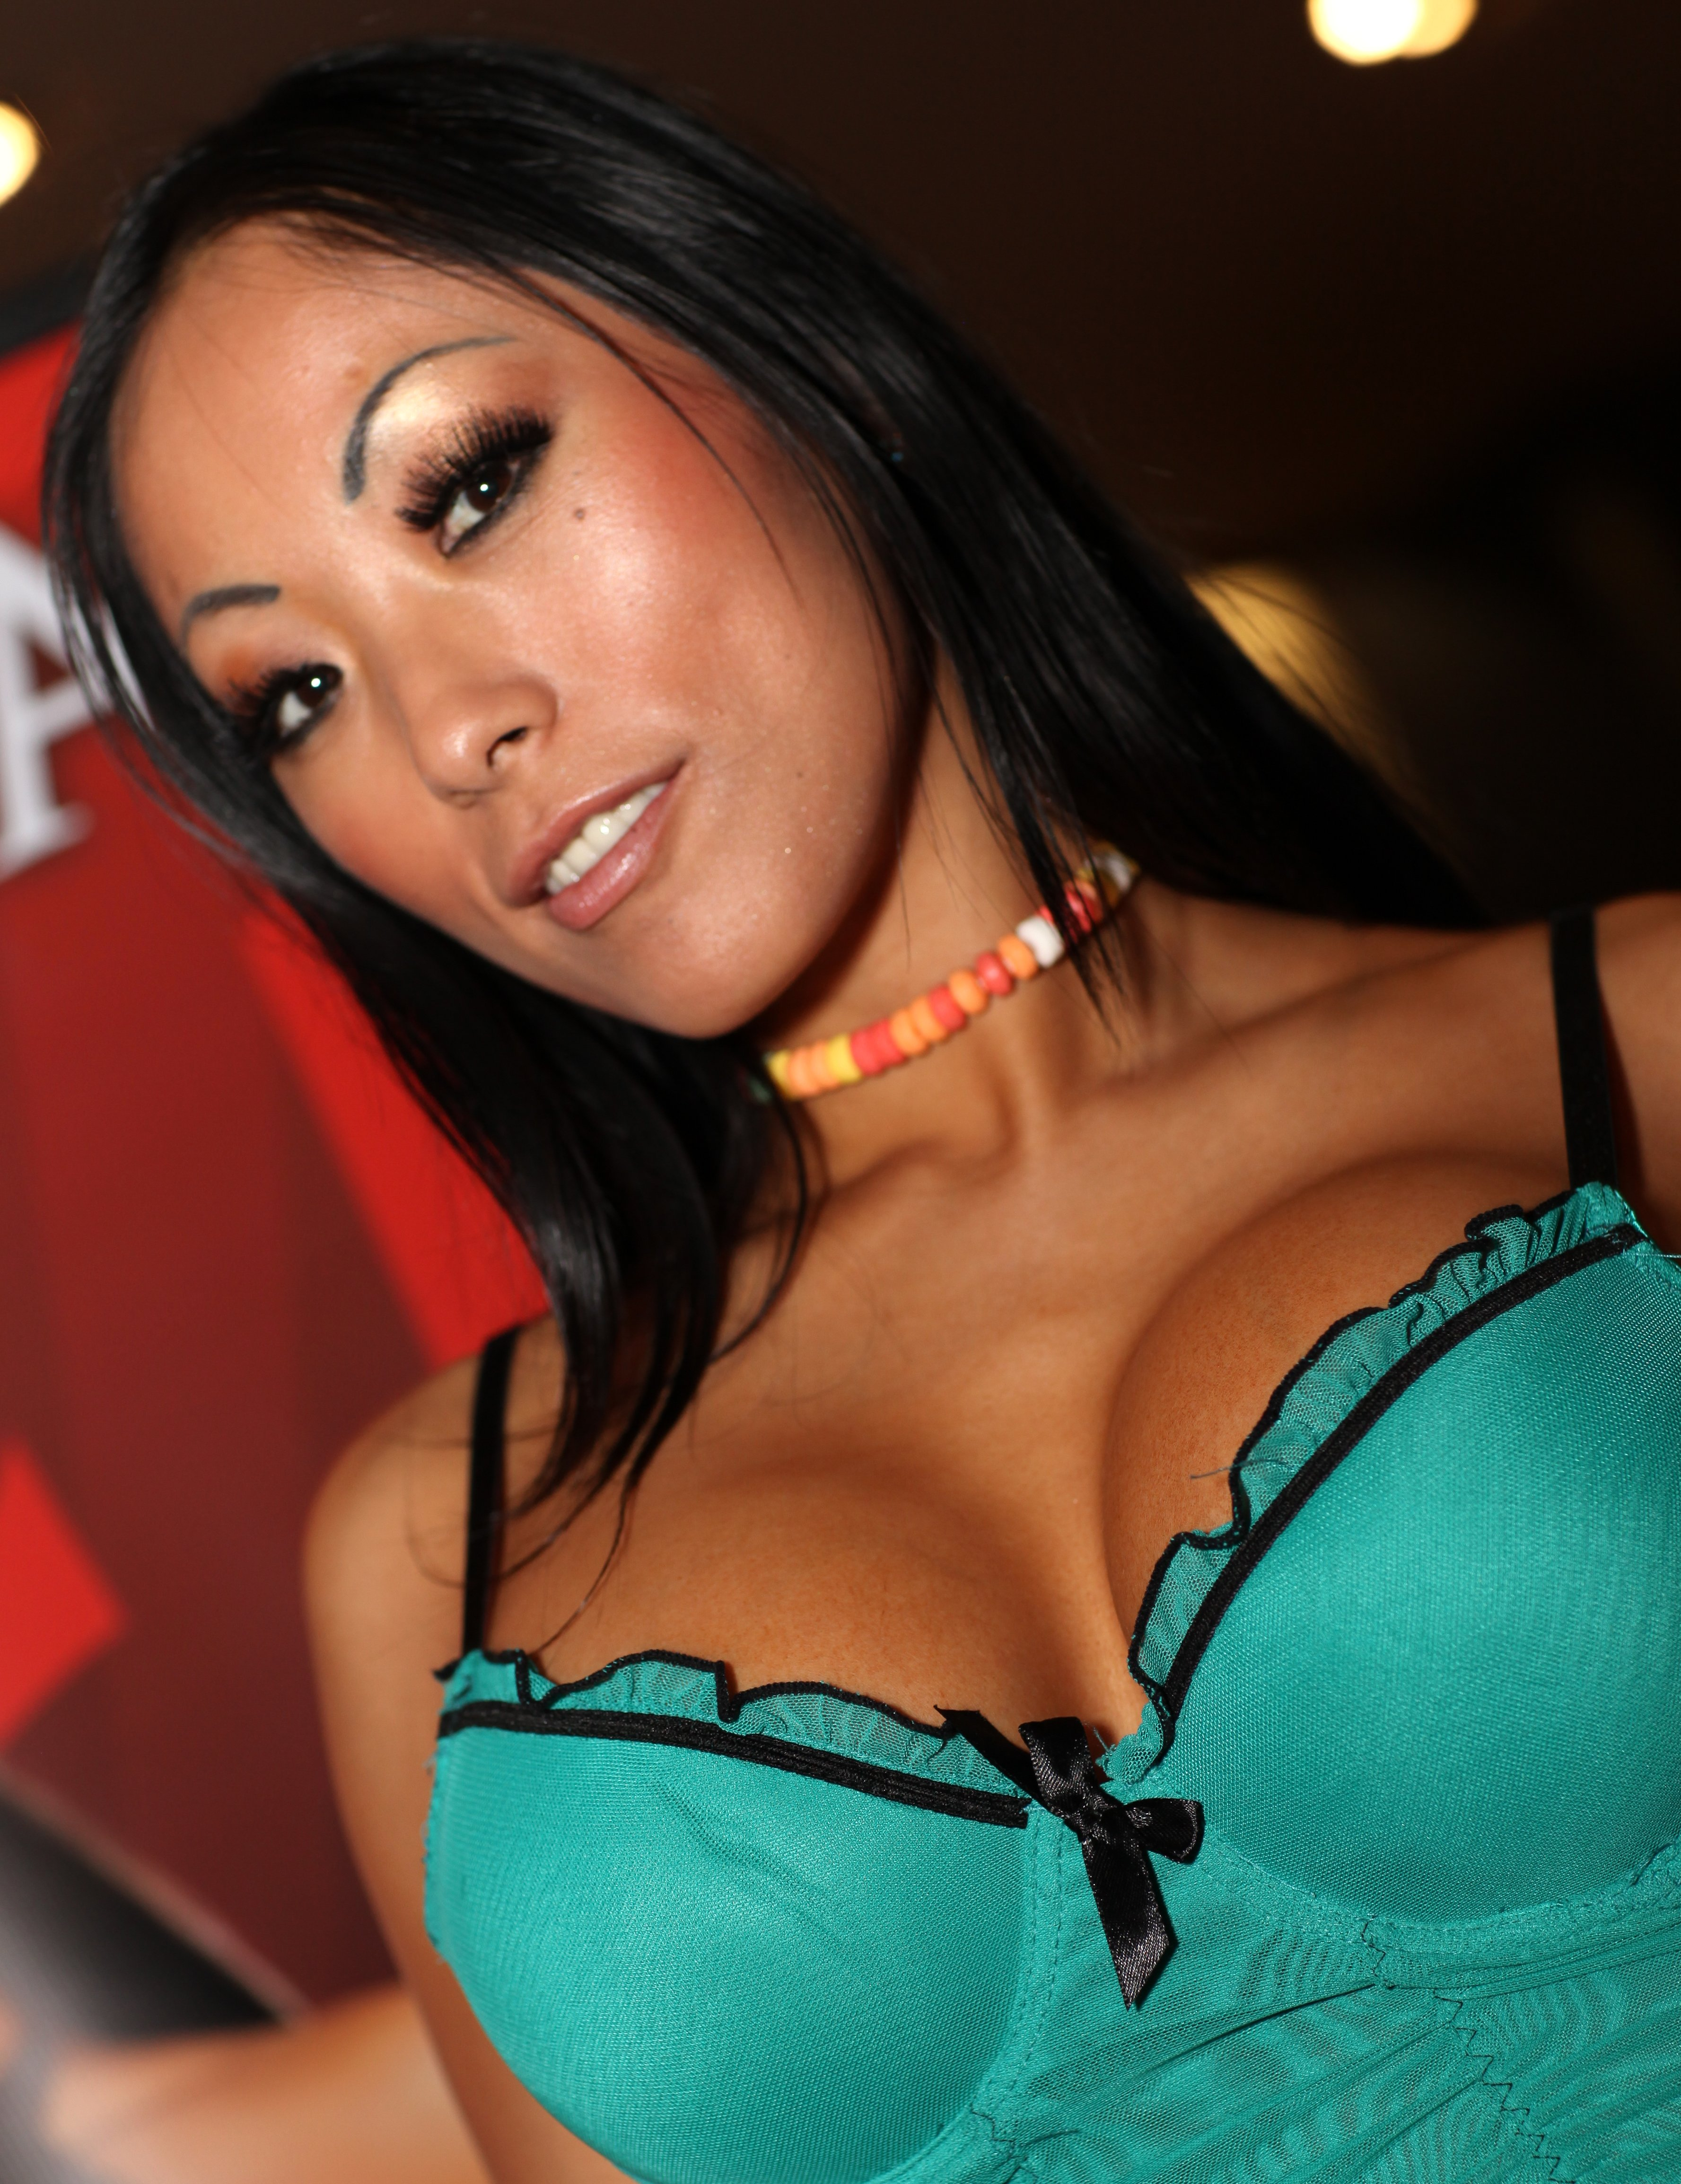 Sensual Las Vegas Pornstar Escorts